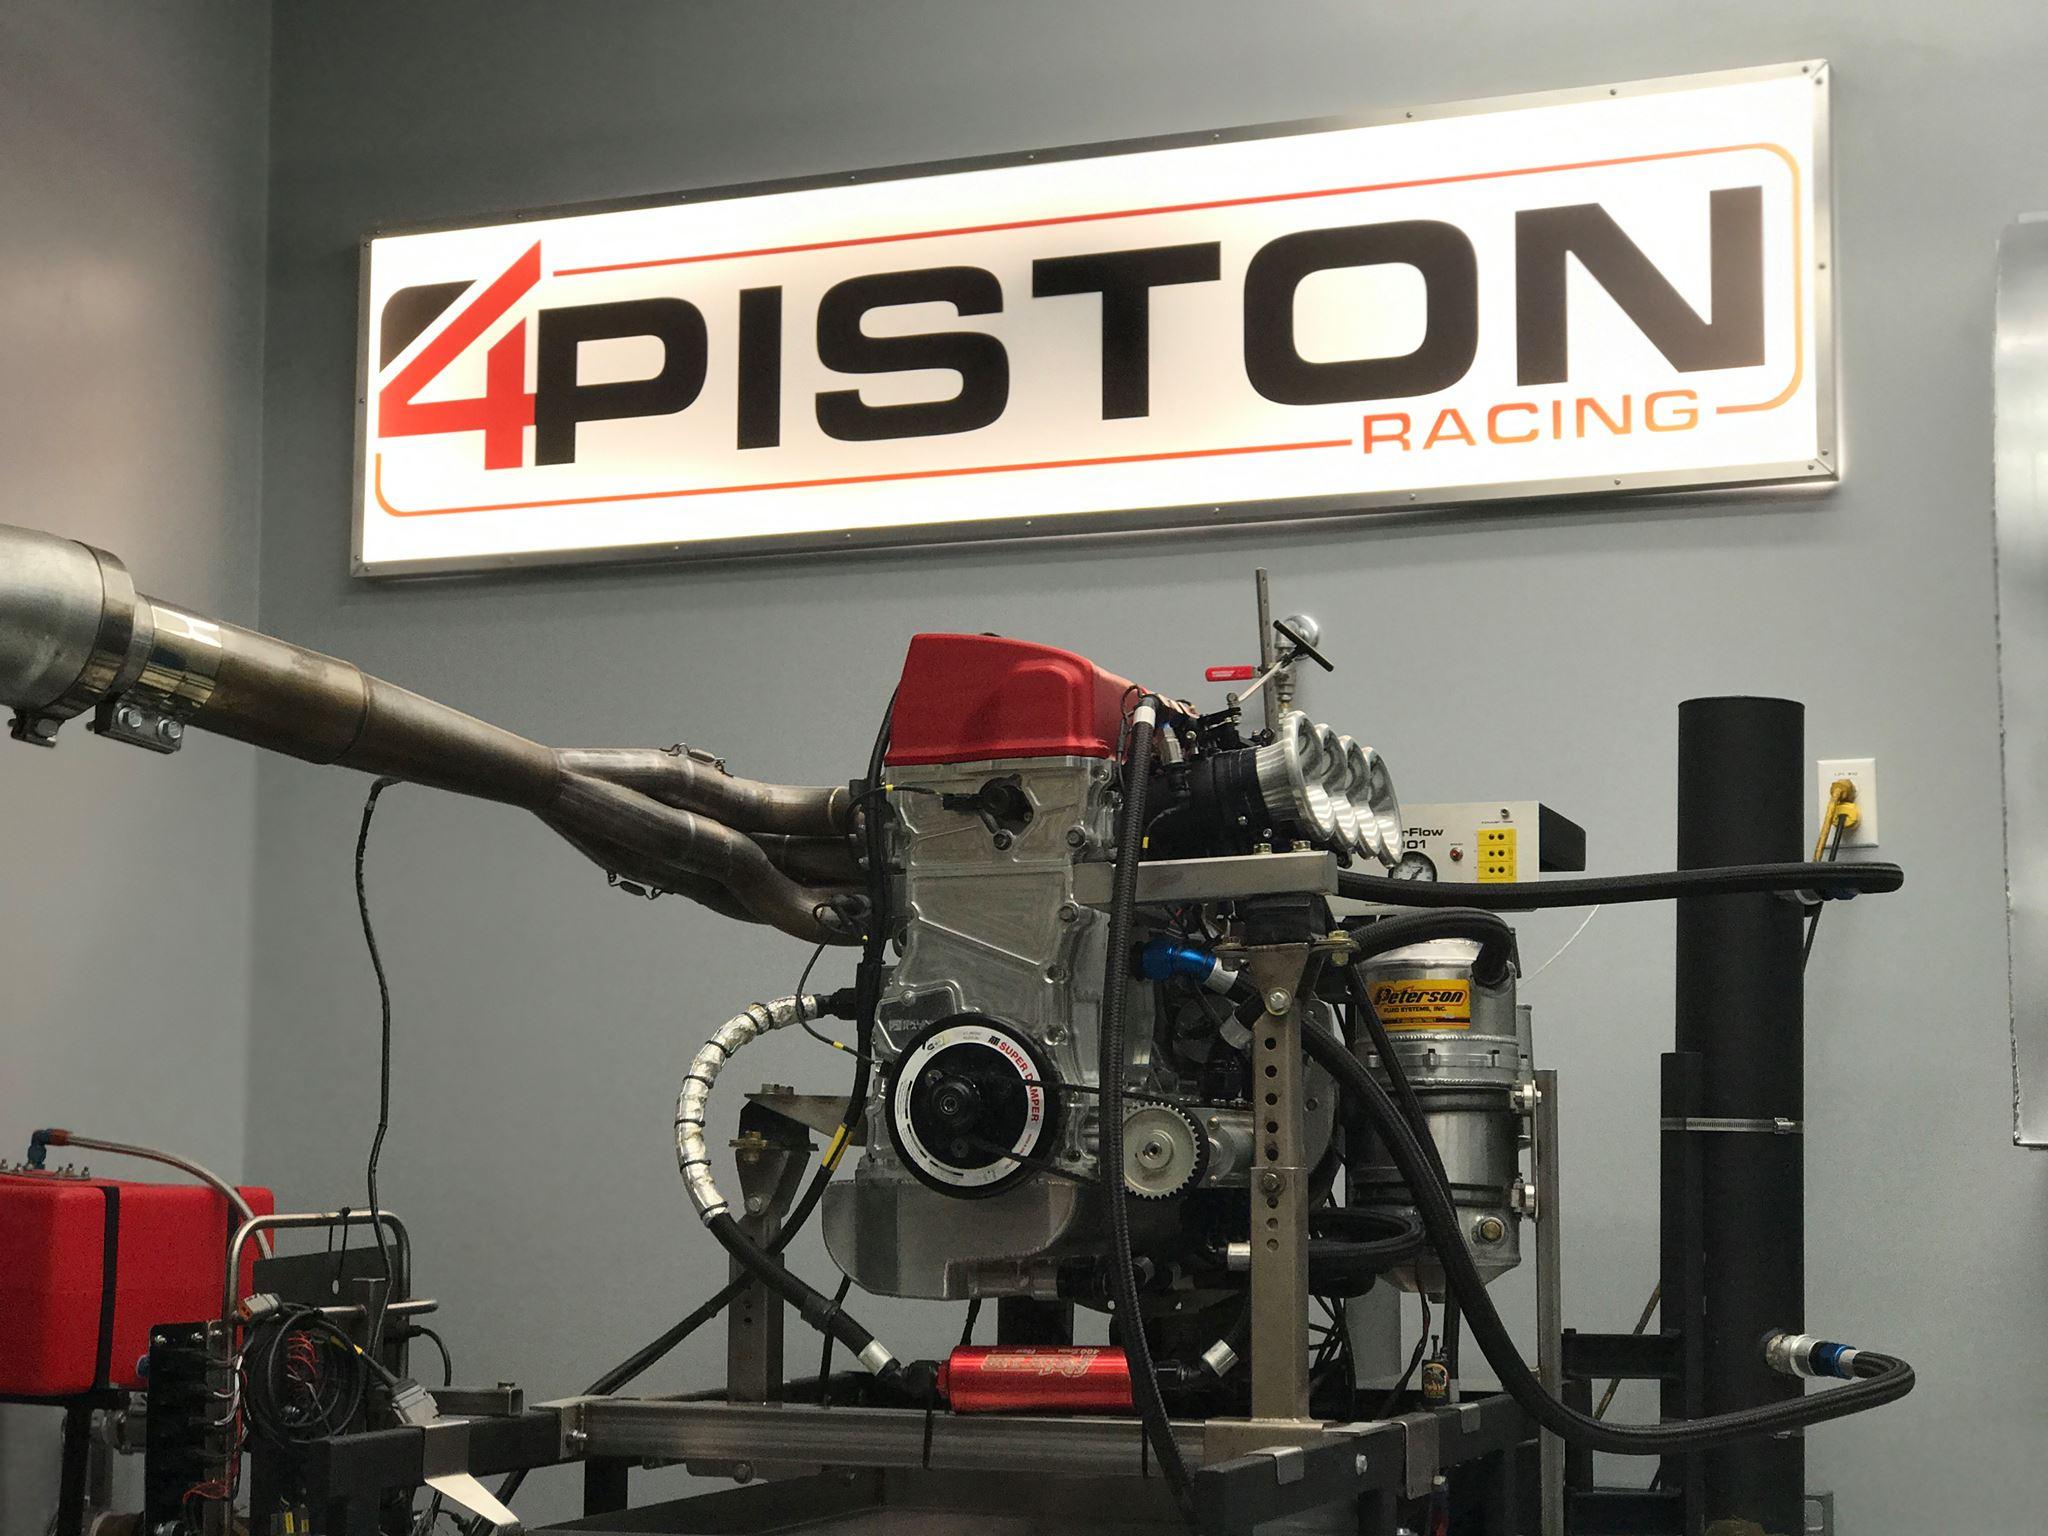 4 Piston Racing S 500 Hp Naturally Aspirated K Series